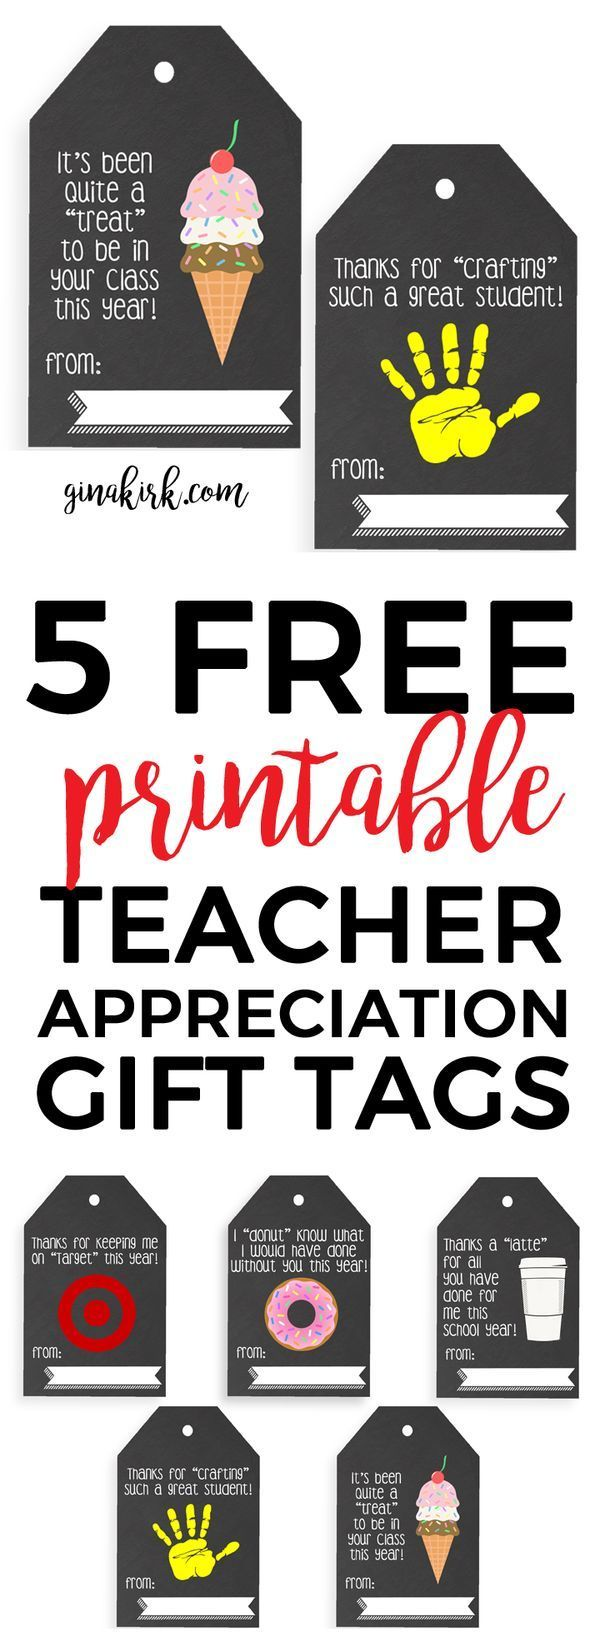 Teacher appreciation gift | DIY teacher gift idea | Printable tag for teacher crafts and gifts! | GinaKirk.com @ginaekirk